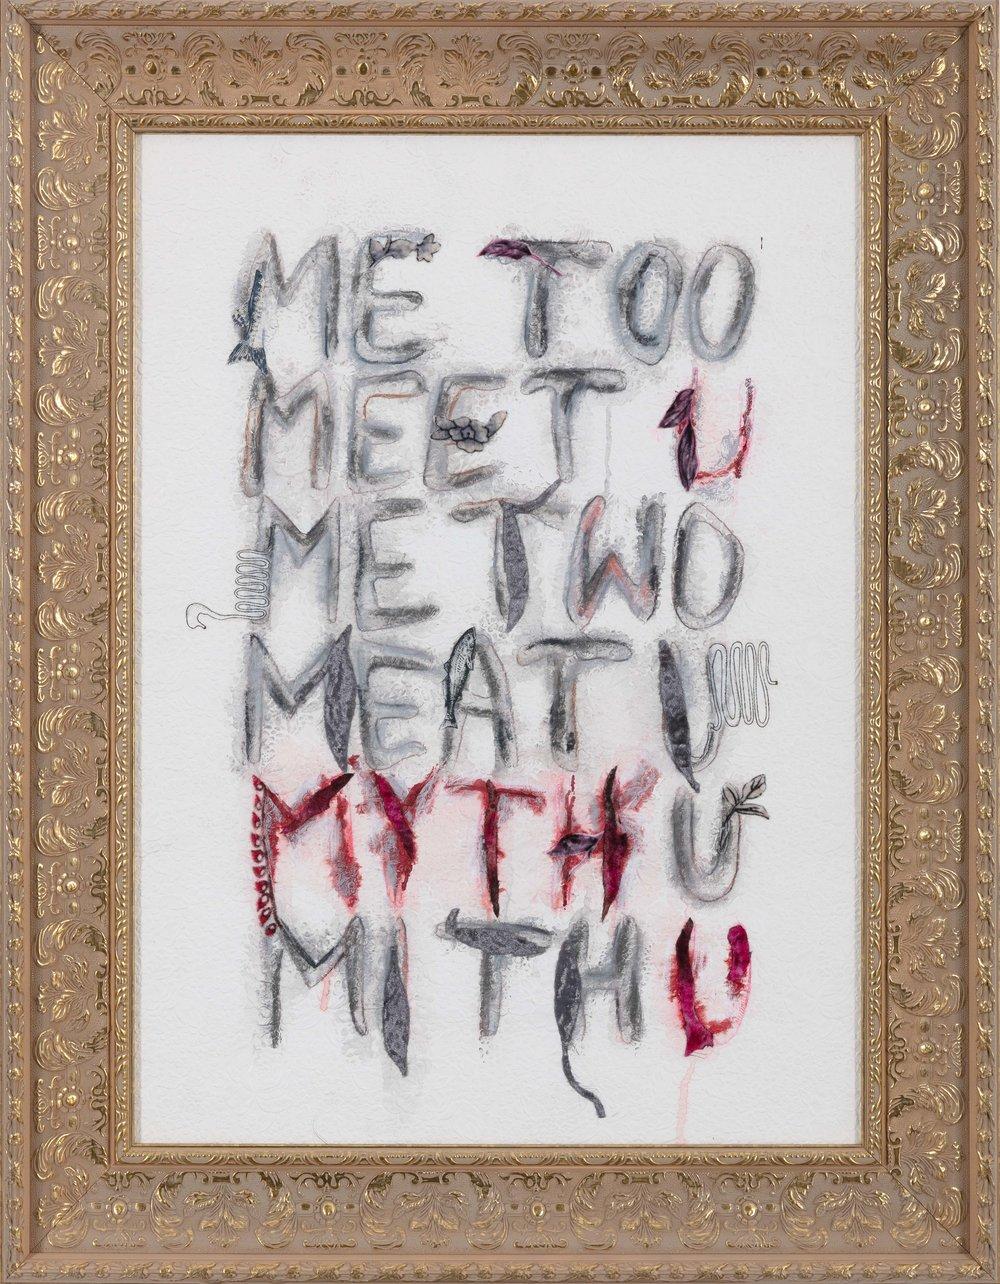 "Mithu Sen | Self Portrait | Mixed media on embossed handmade paper | 29"" x 21.5"" | 2010"